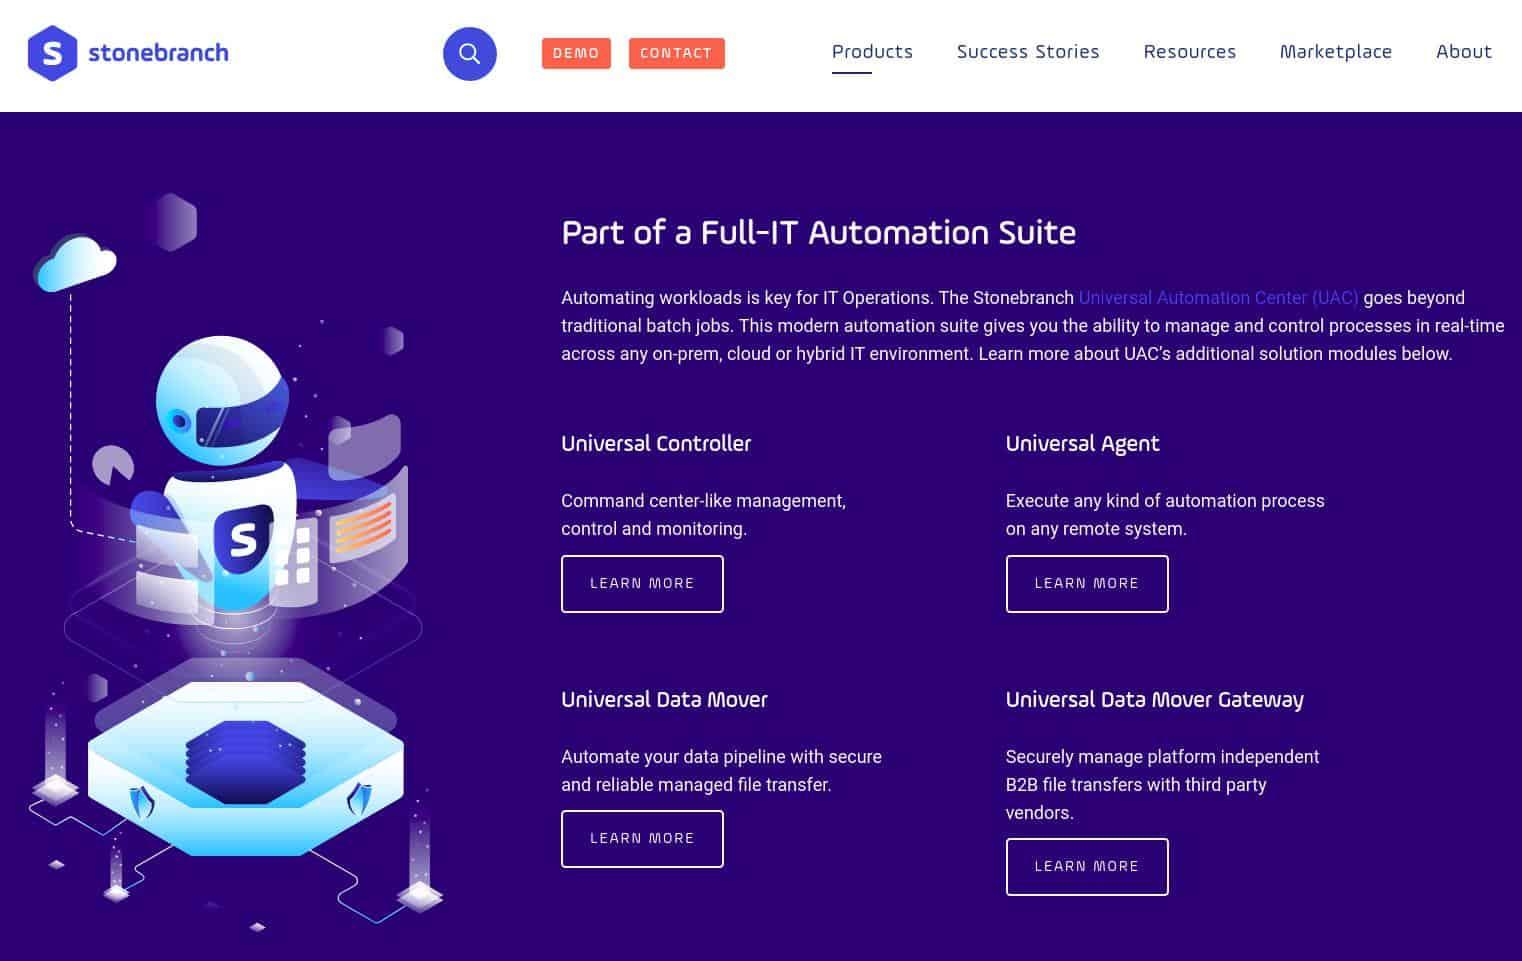 stonebranch IT Automation